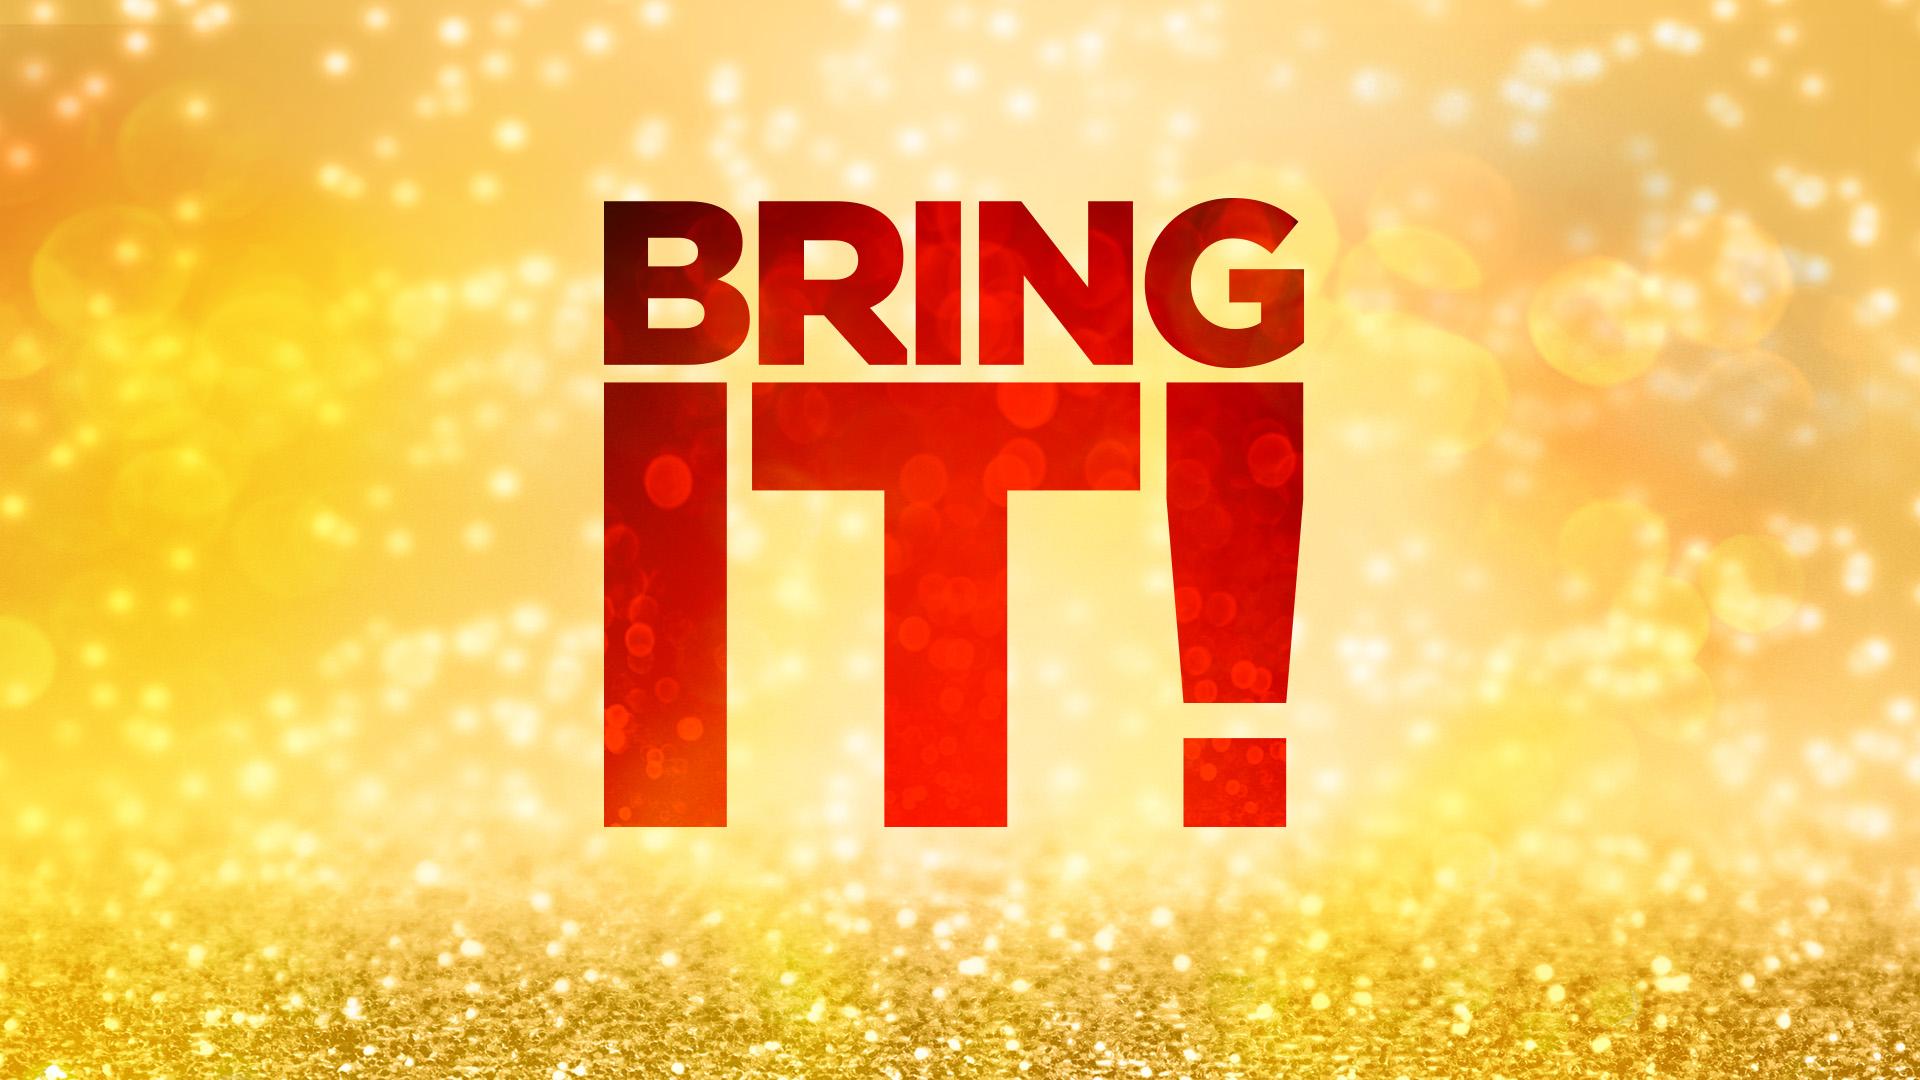 Bring It! Alt Image